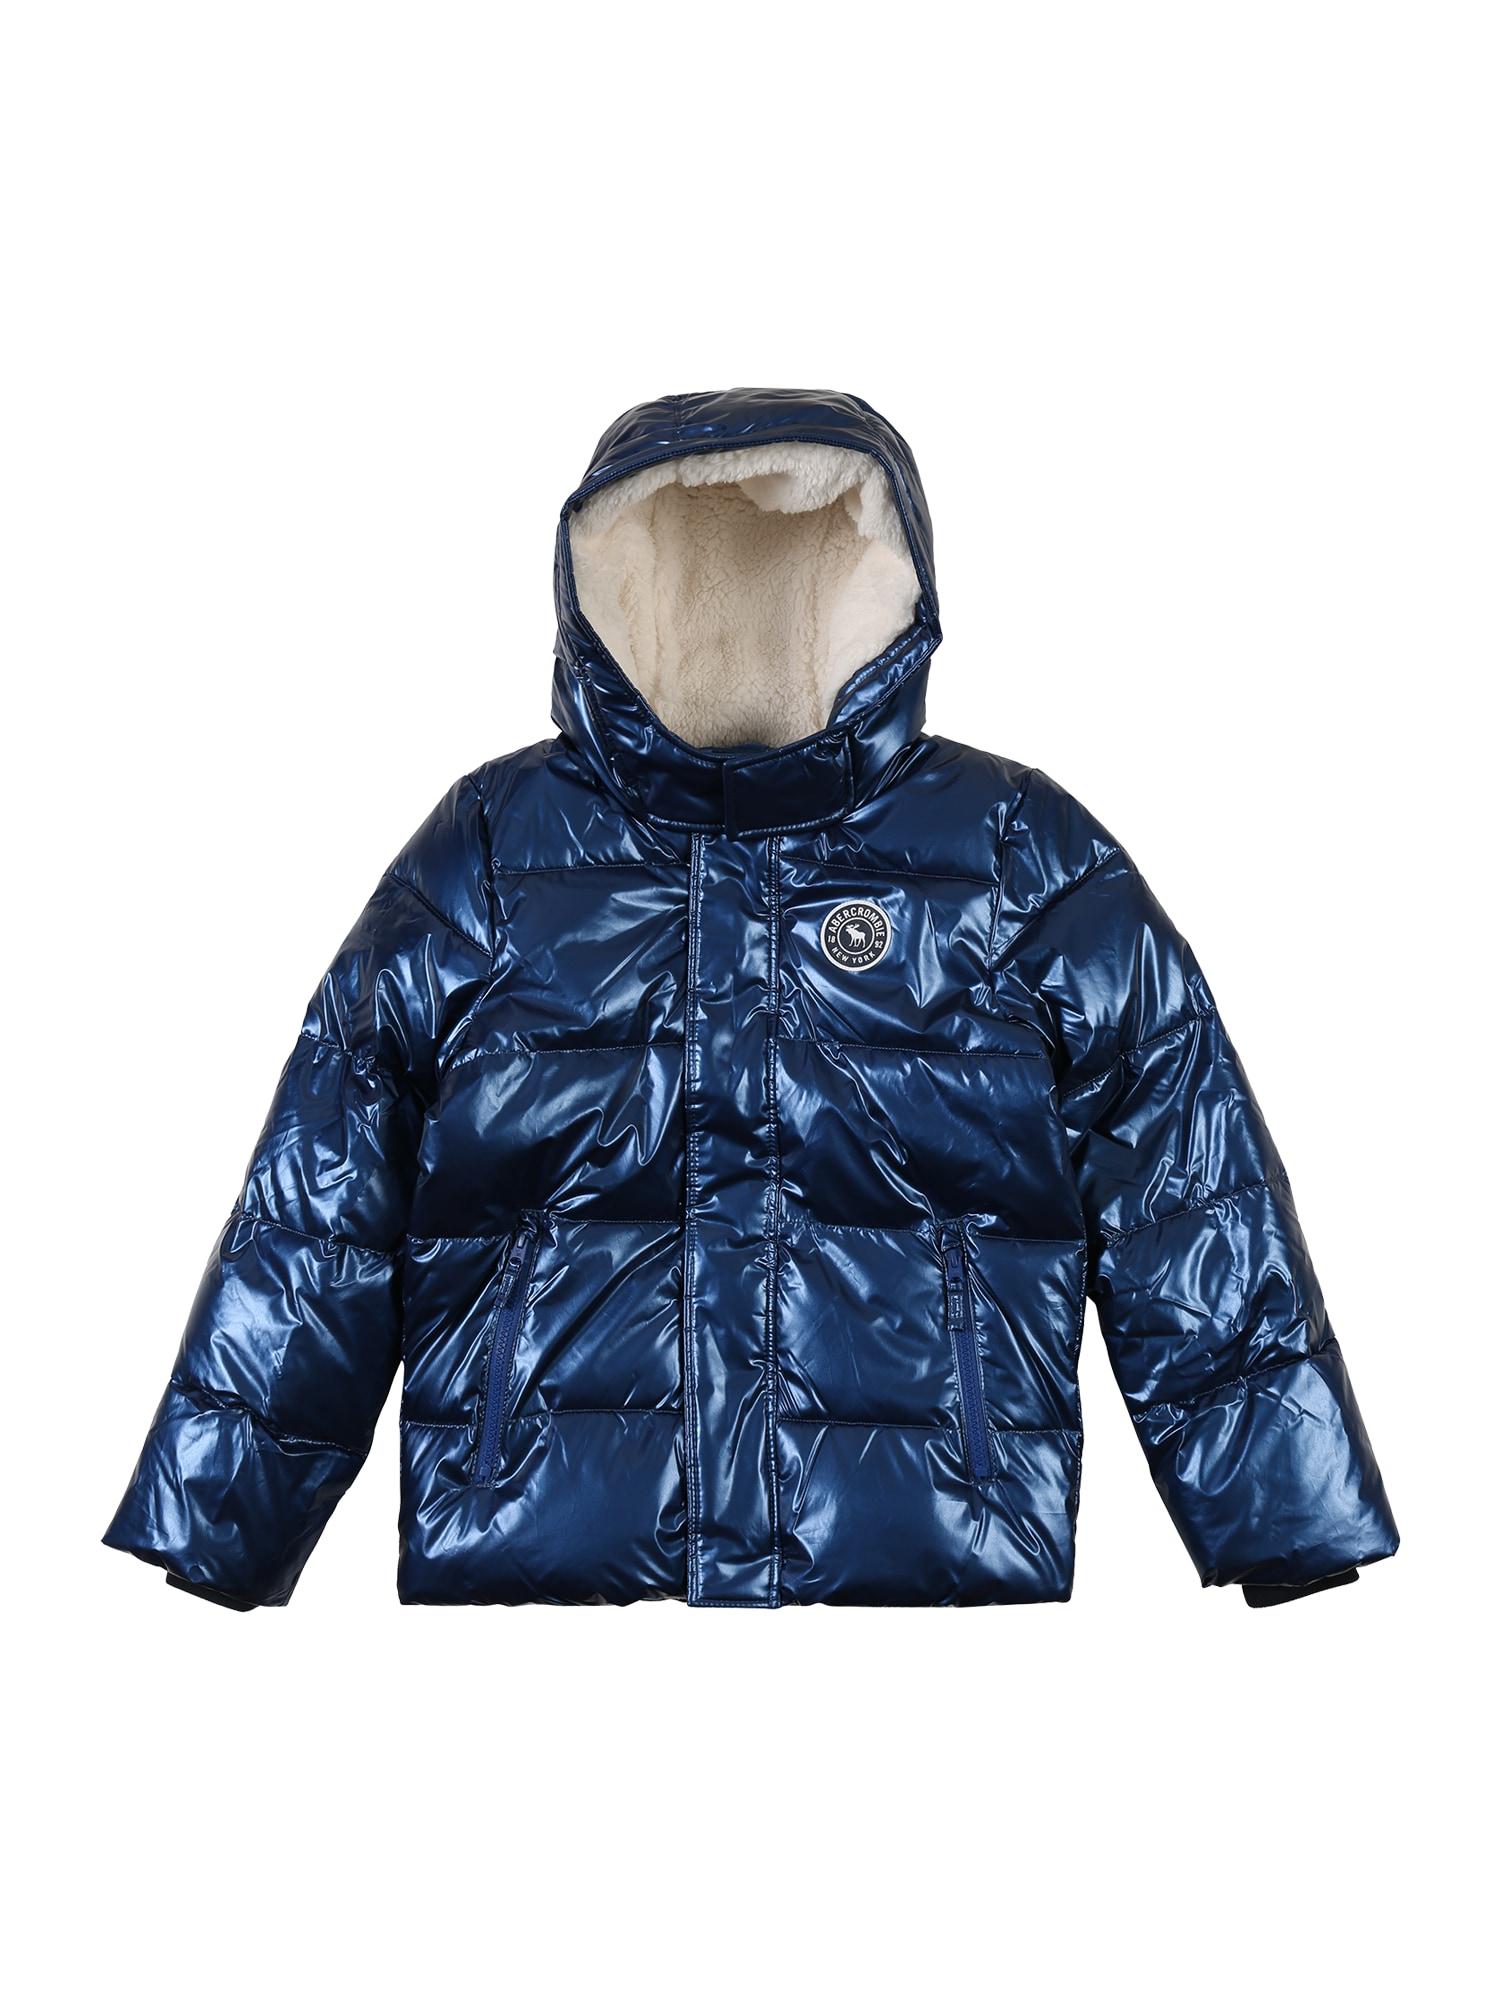 Abercrombie & Fitch Žieminė striukė mėlyna